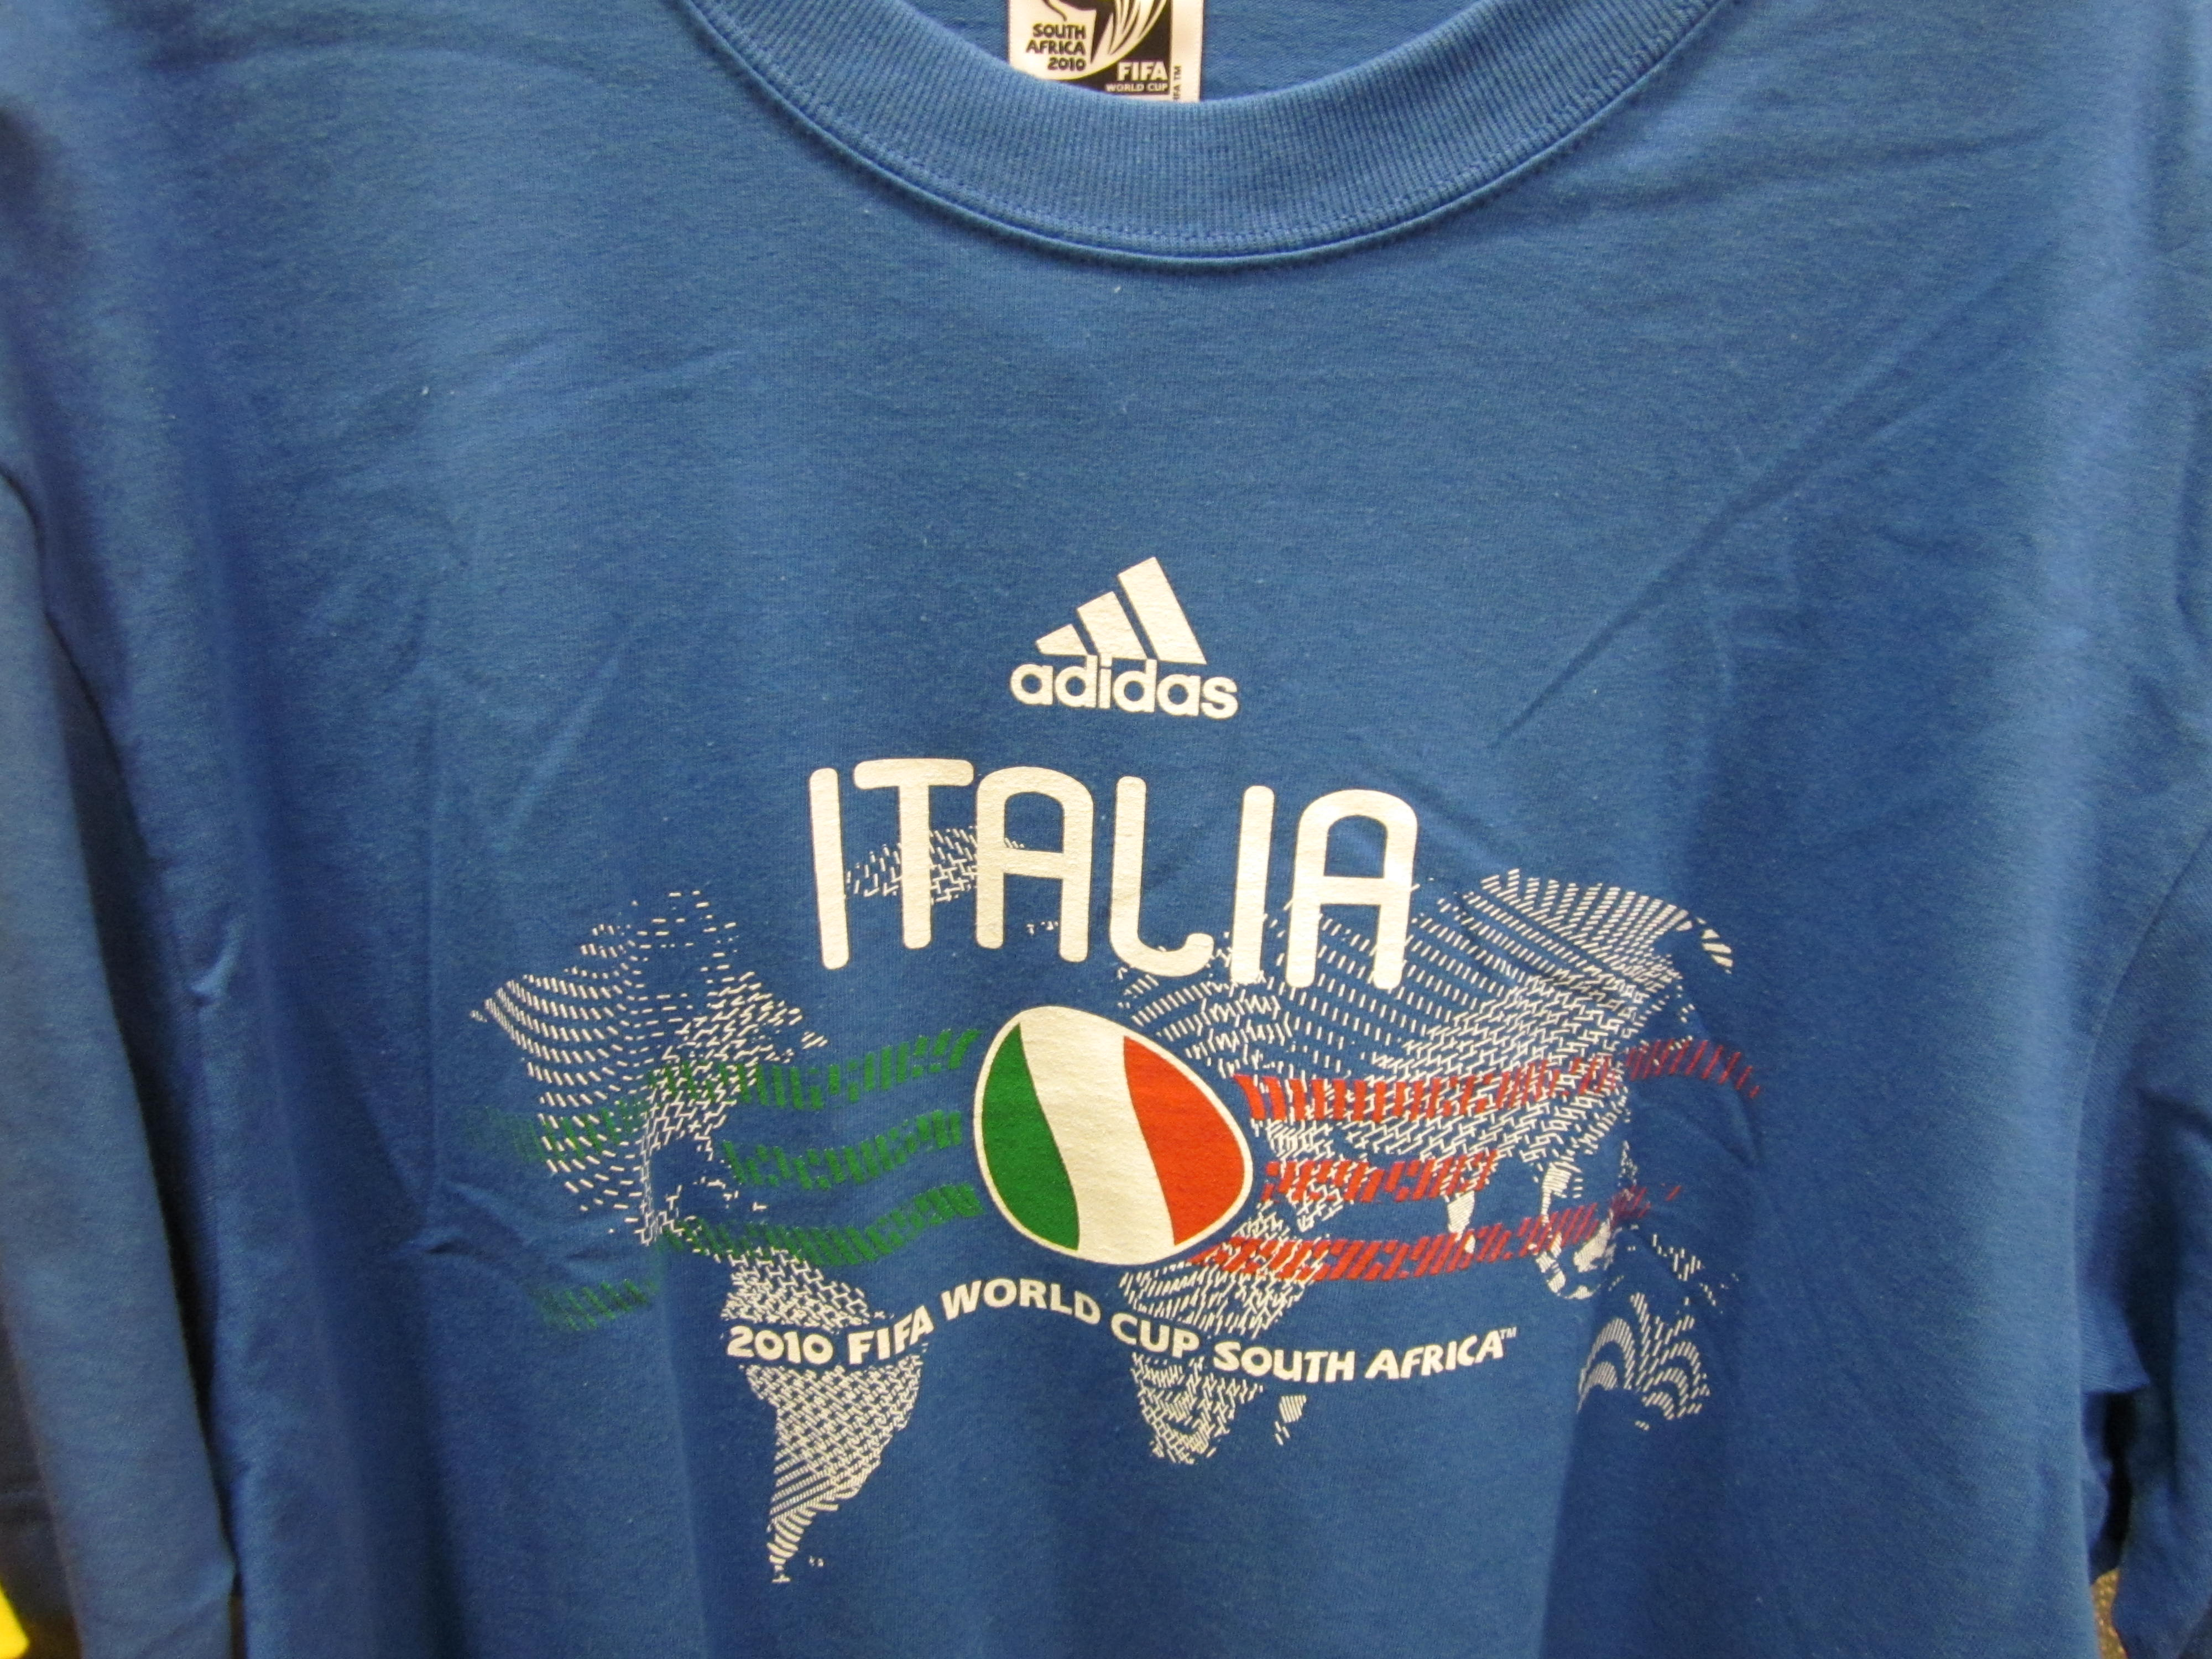 adidas italia history